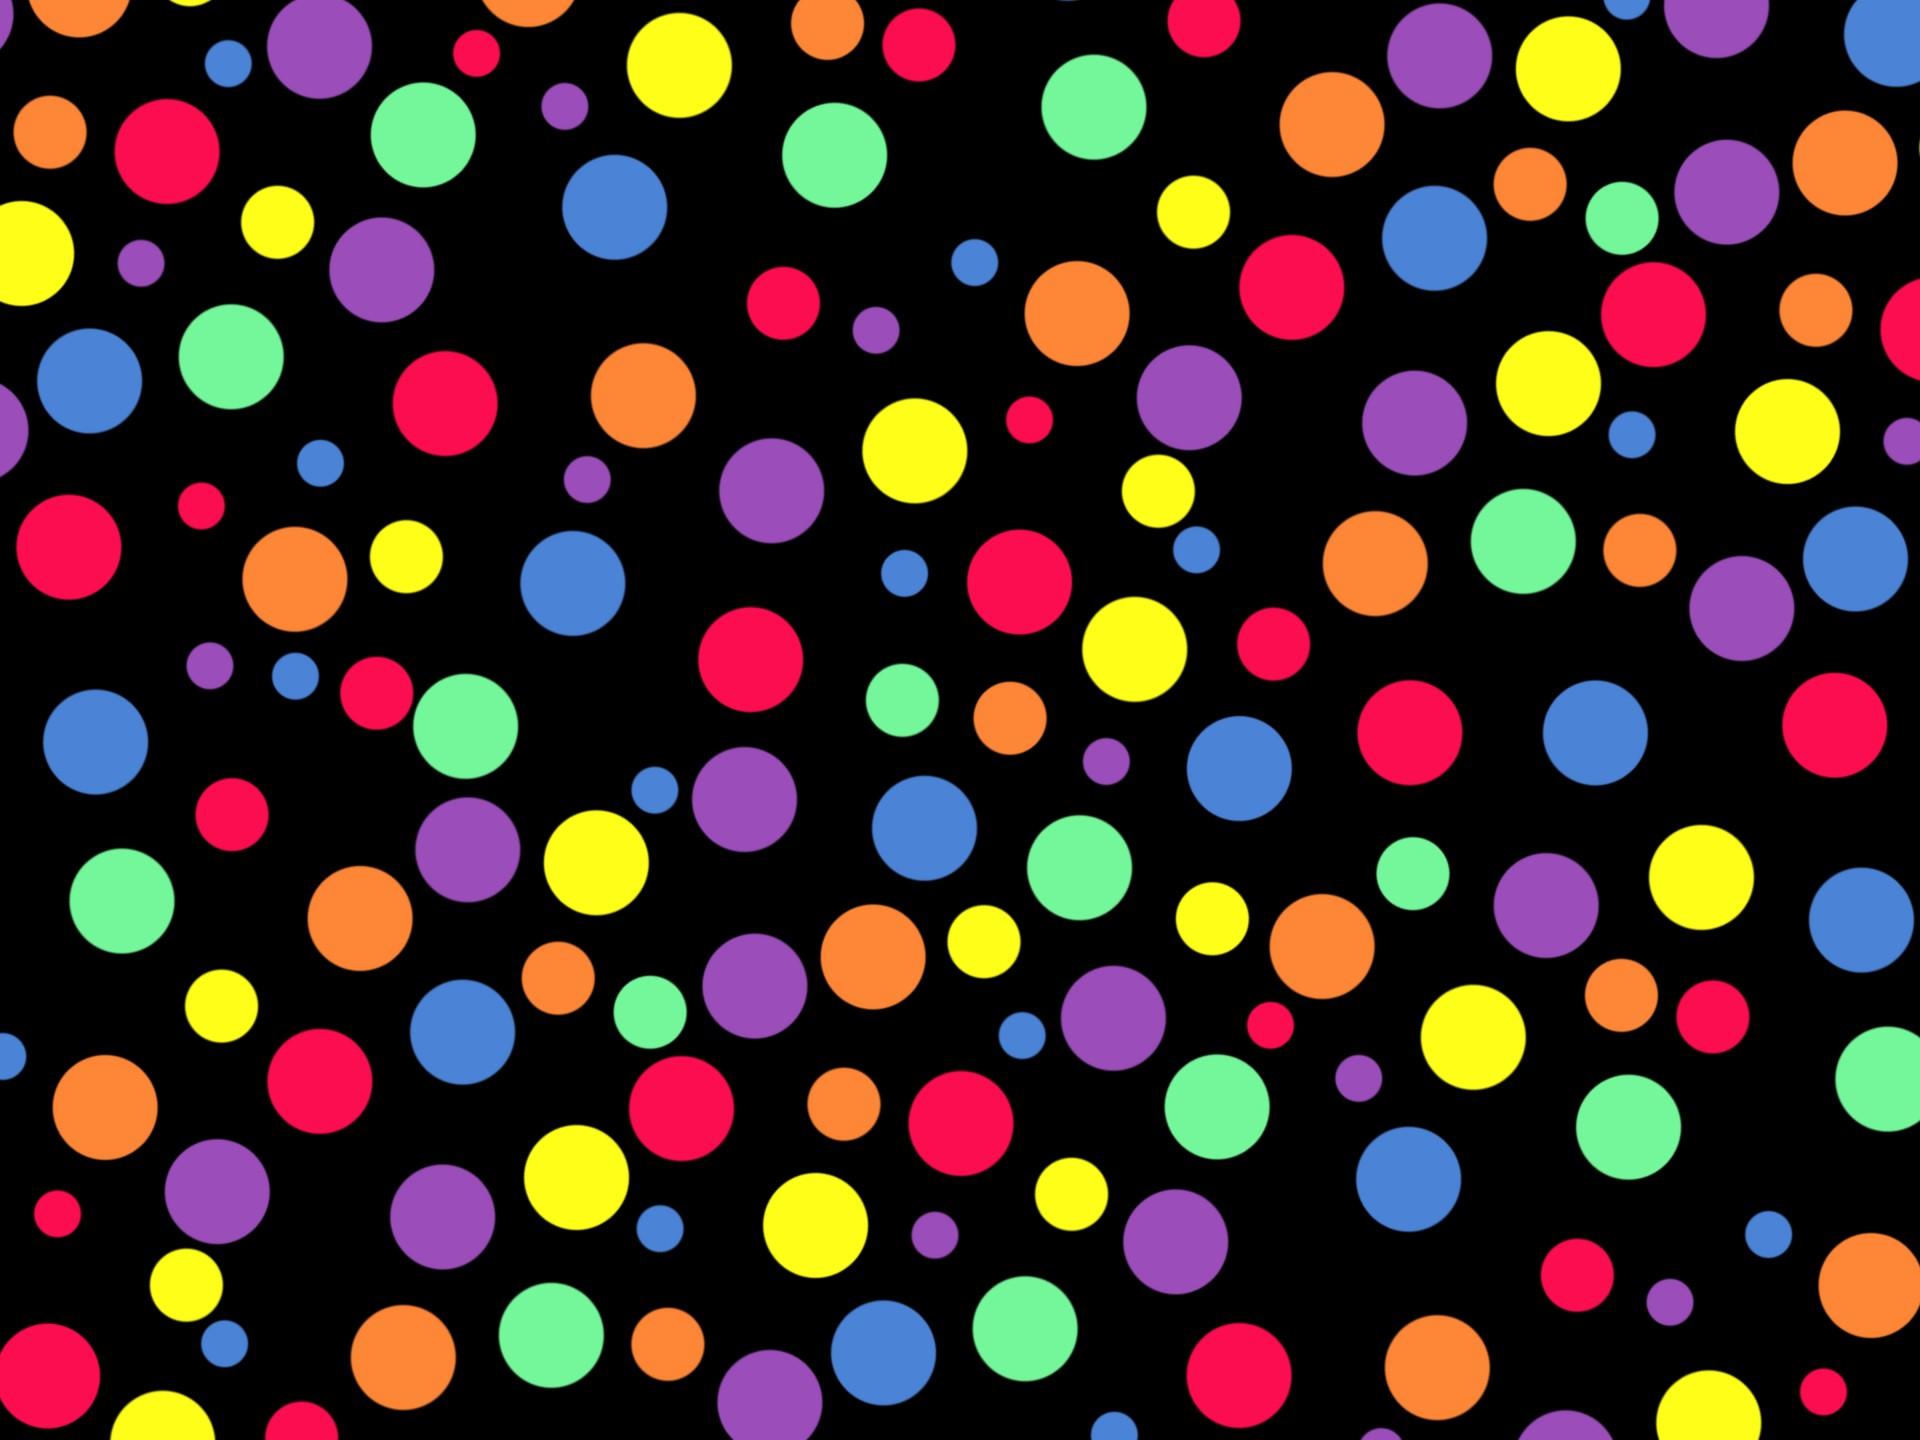 Black Dot Wallpaper Multicolor Dots Free Stock Photo Public Domain Pictures